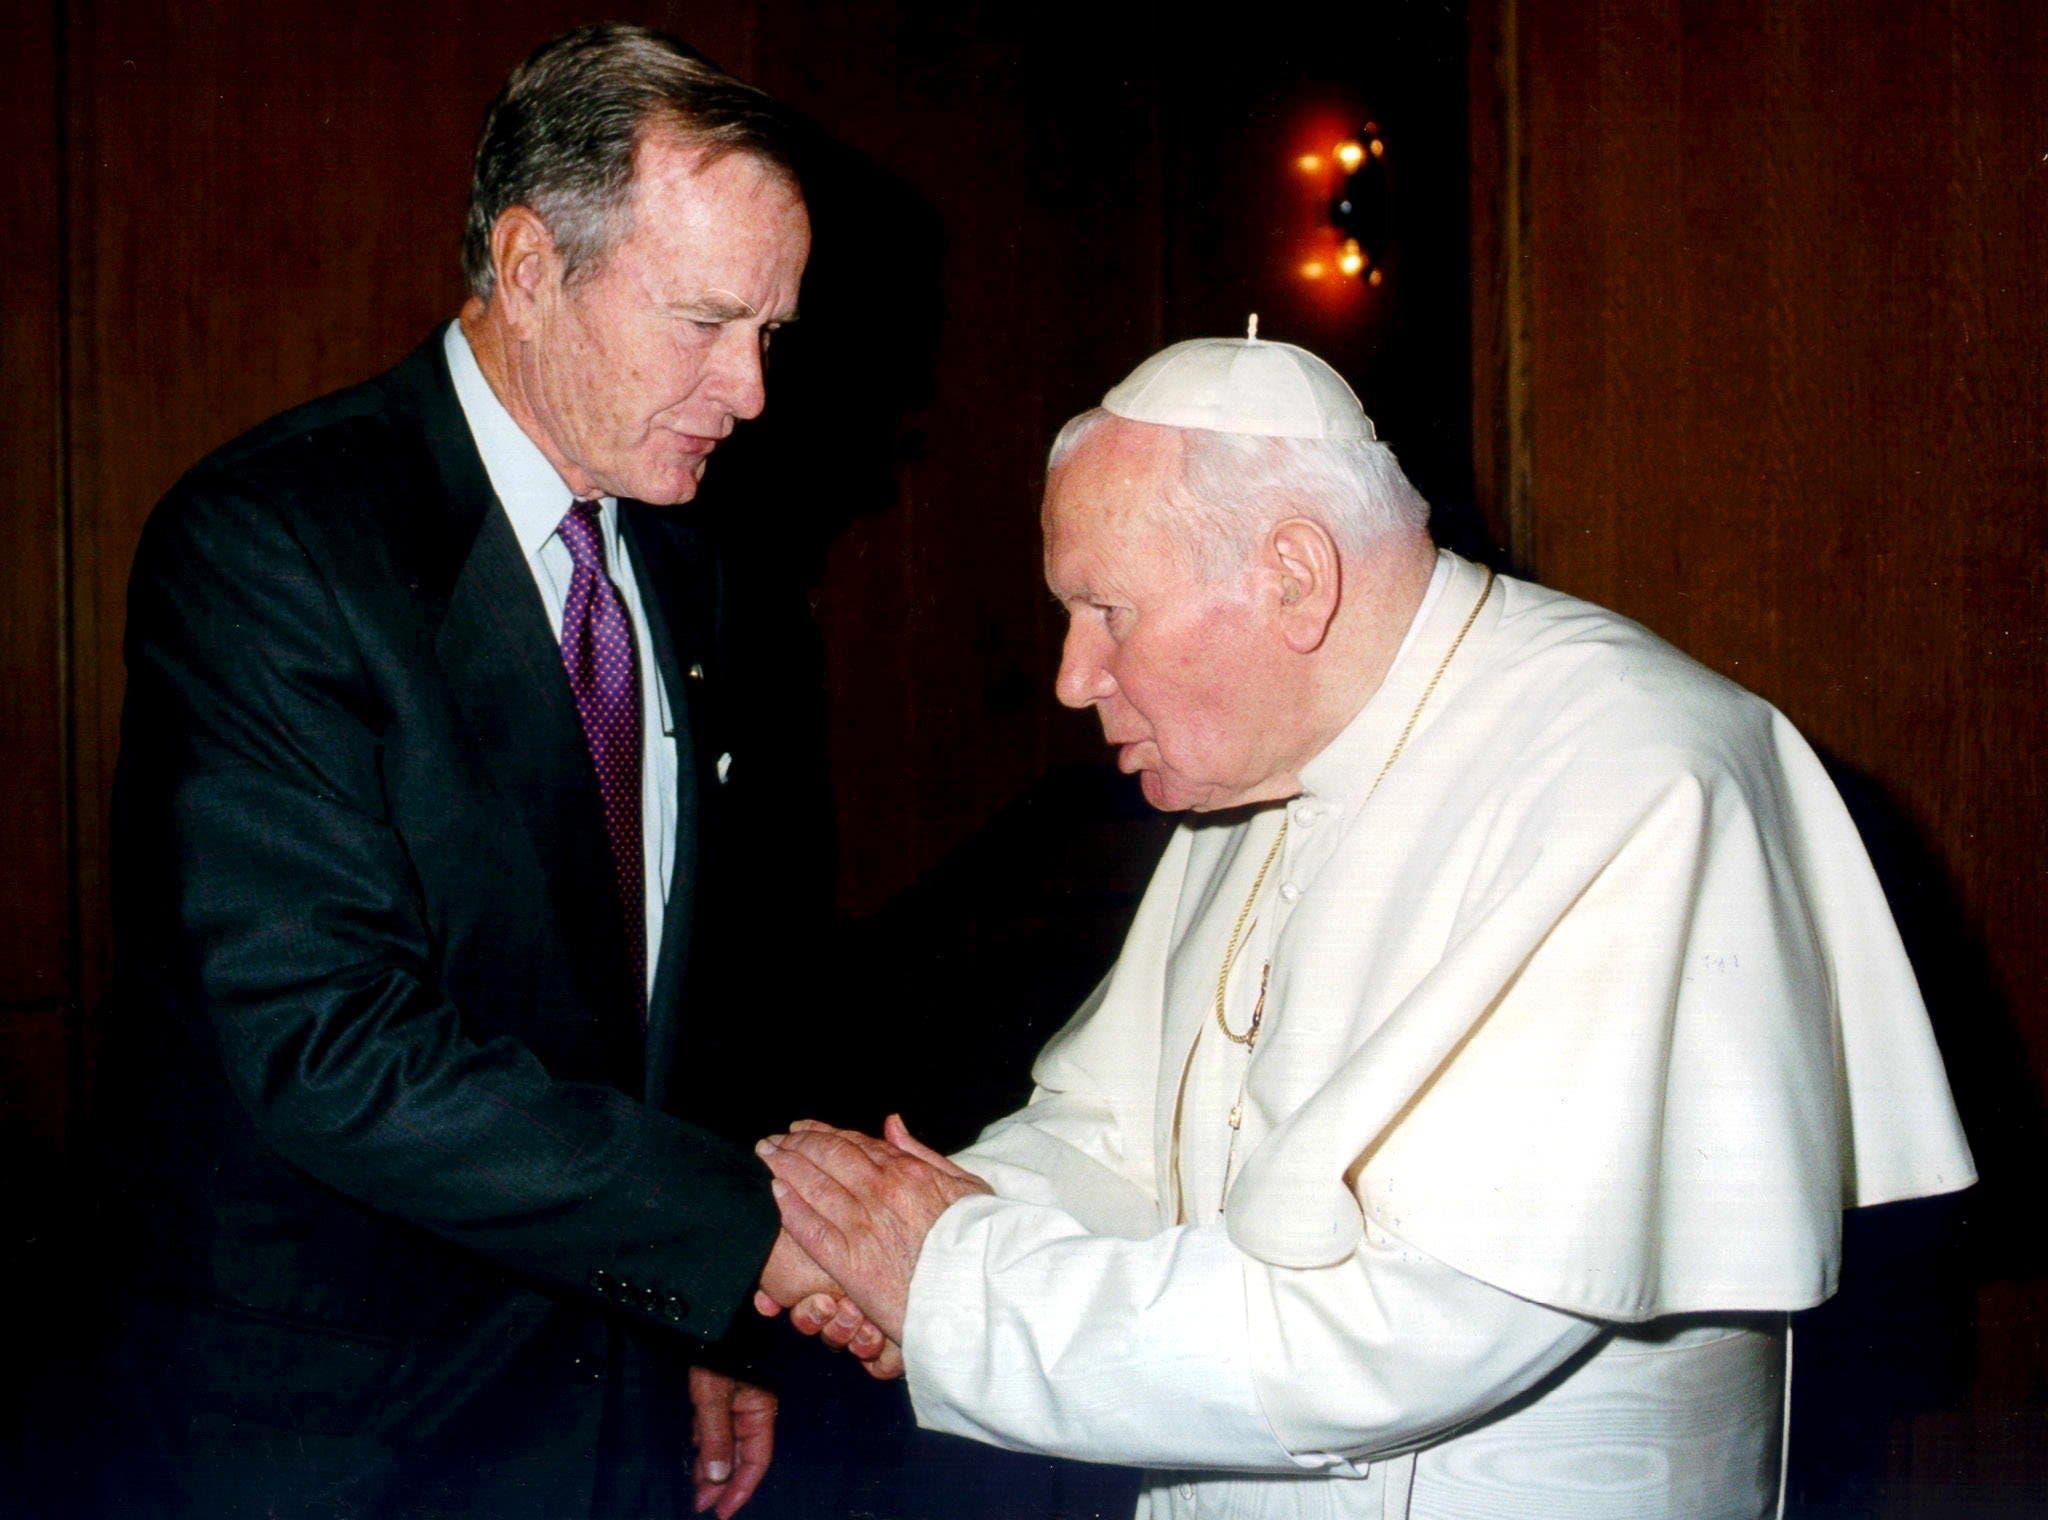 Bush bei einer privaten Audienz mit Papst Johannes Paul II im Vatikan. (Bild: EPA/ANSA / VATICAN POOL, 4. Oktober 2001)